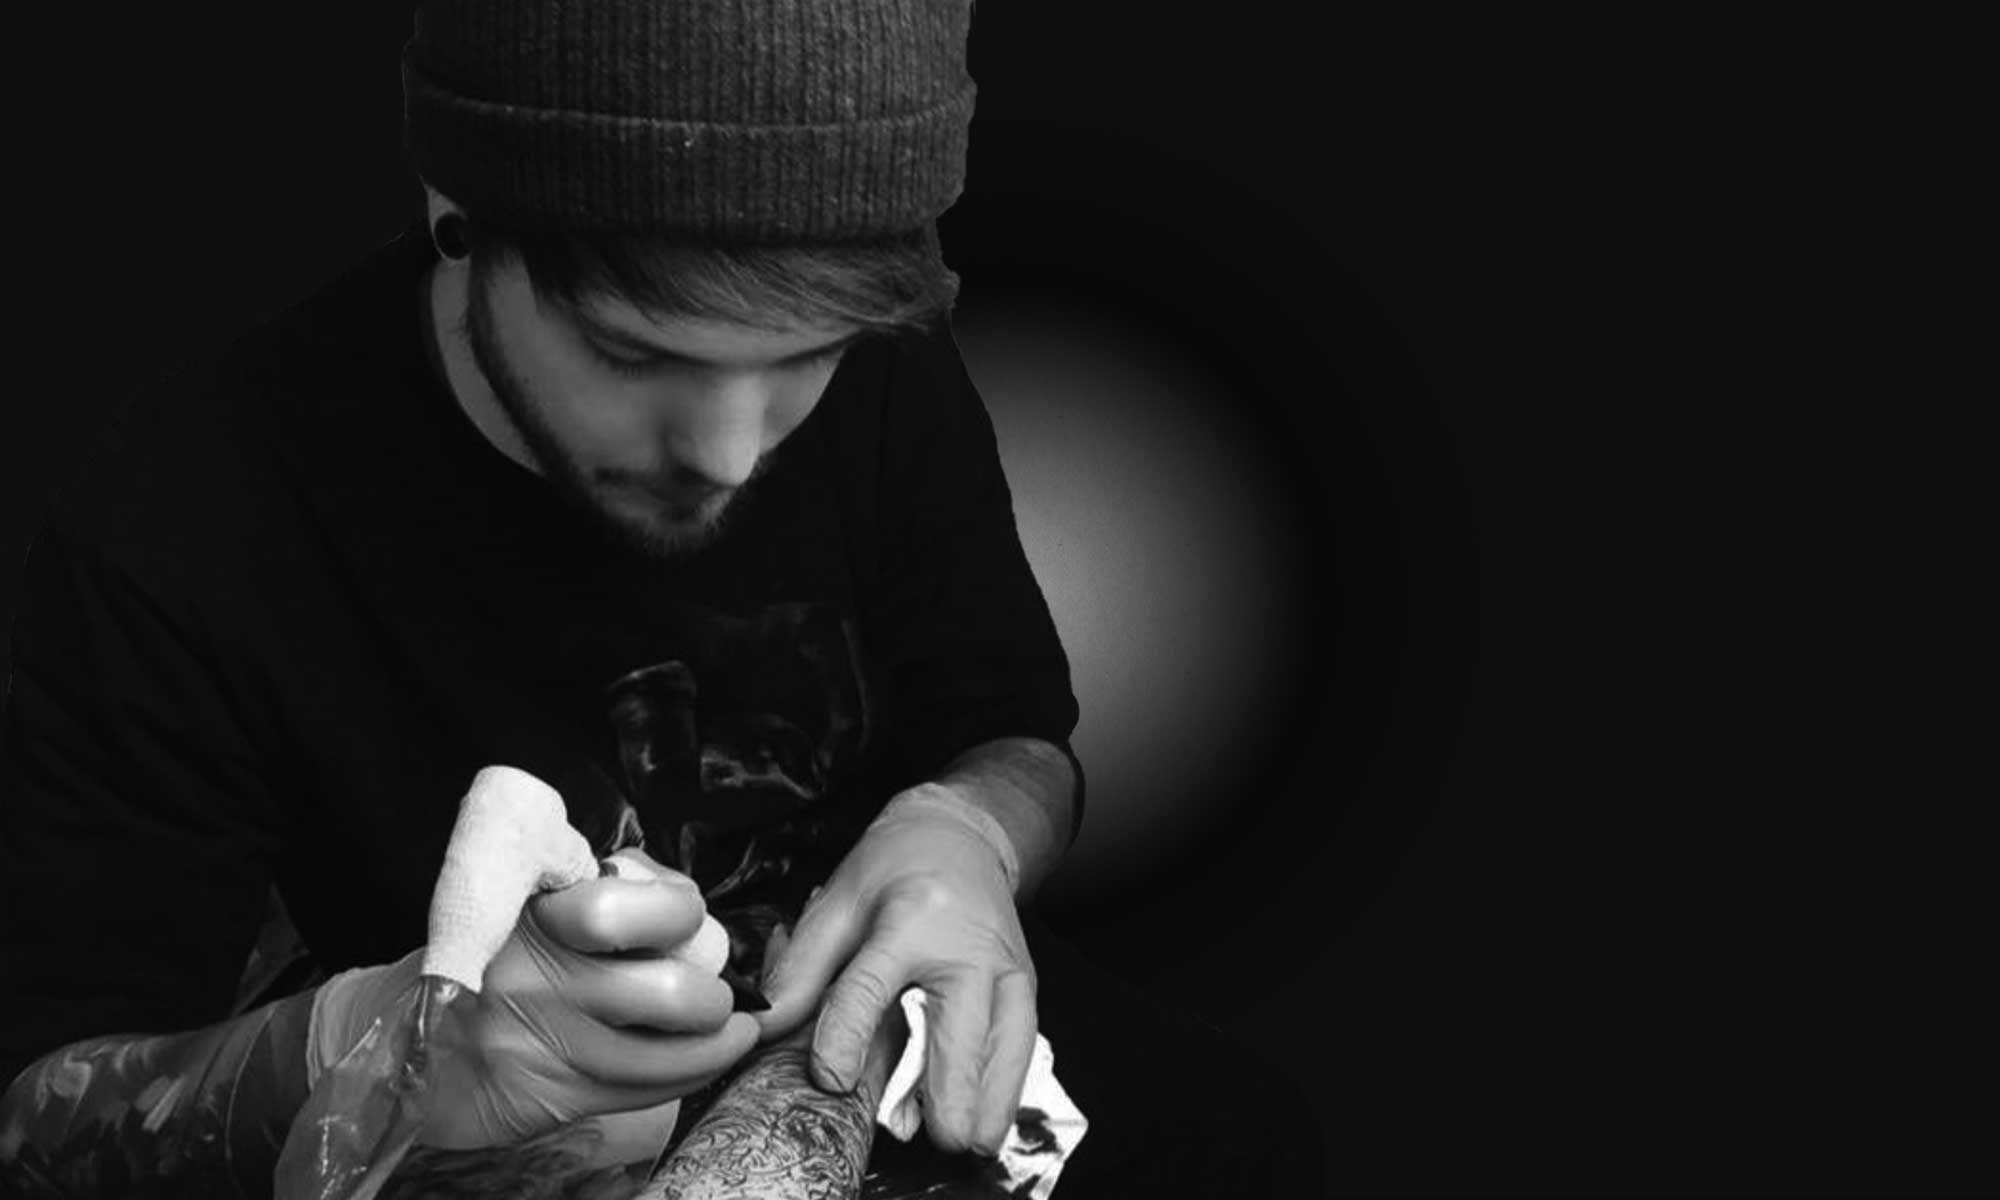 Artist Tomek